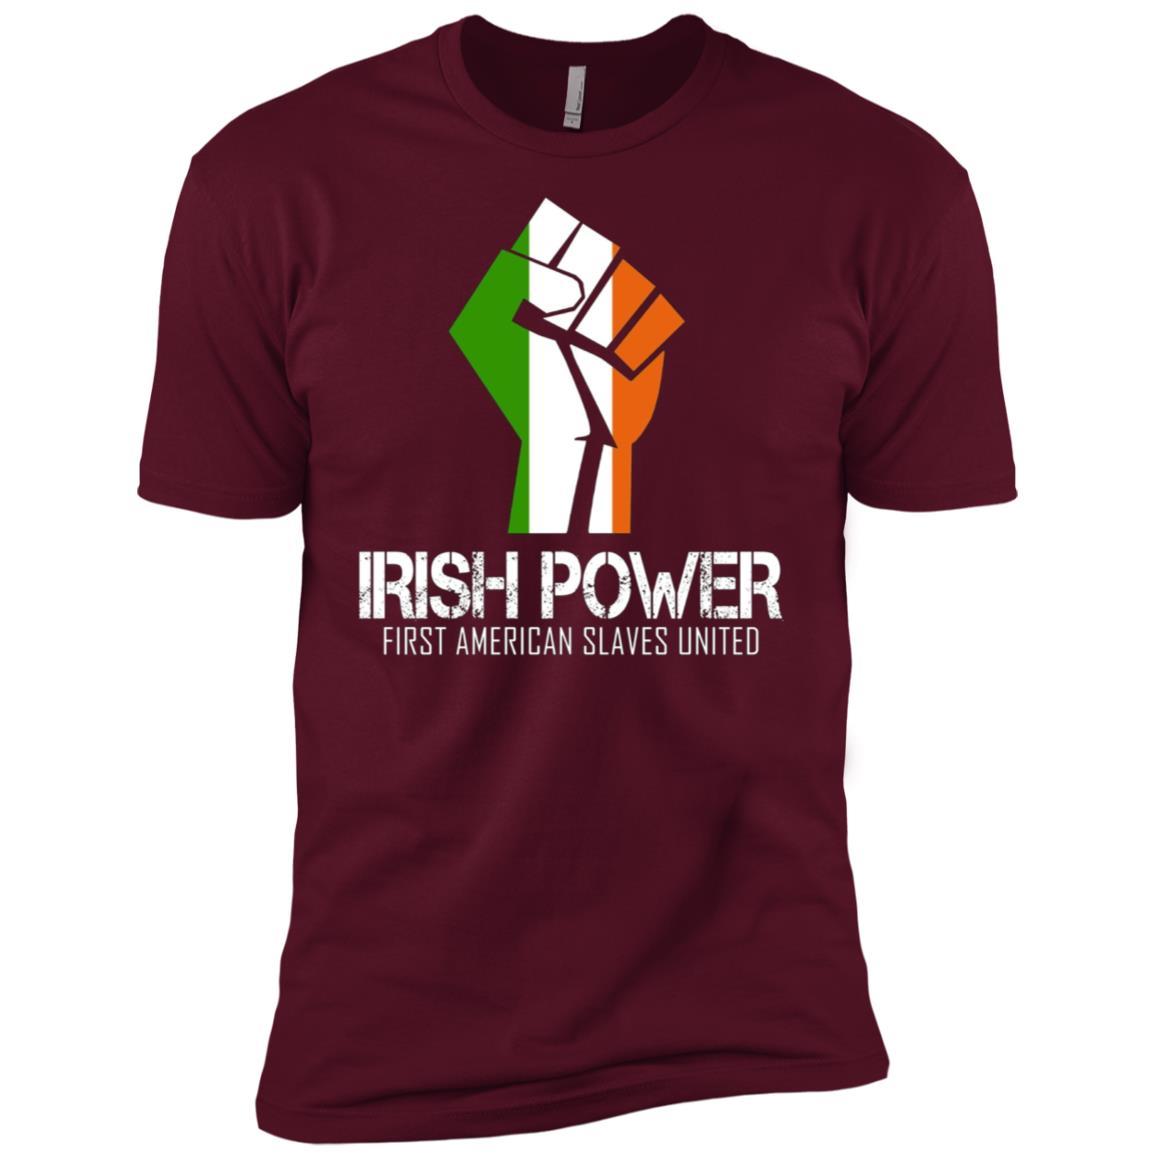 Irish power American slaves united – Cool saying Men Short Sleeve T-Shirt